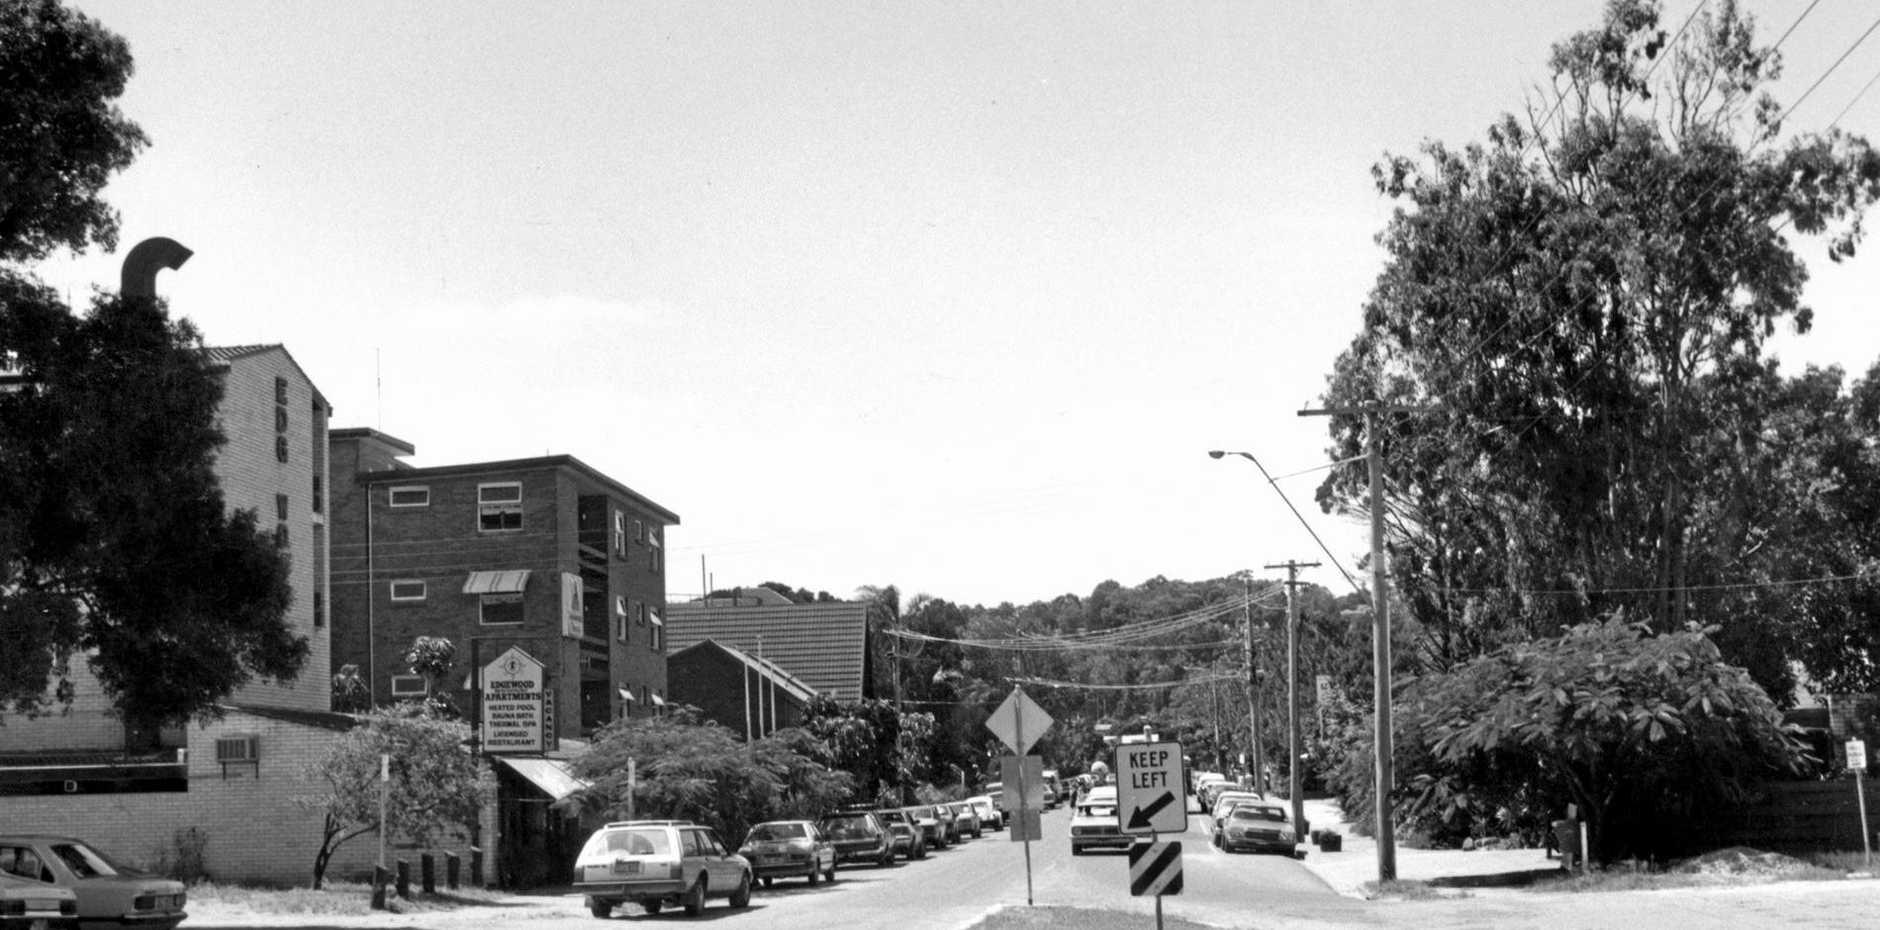 Historical photo of Hastings Street, Noosa.